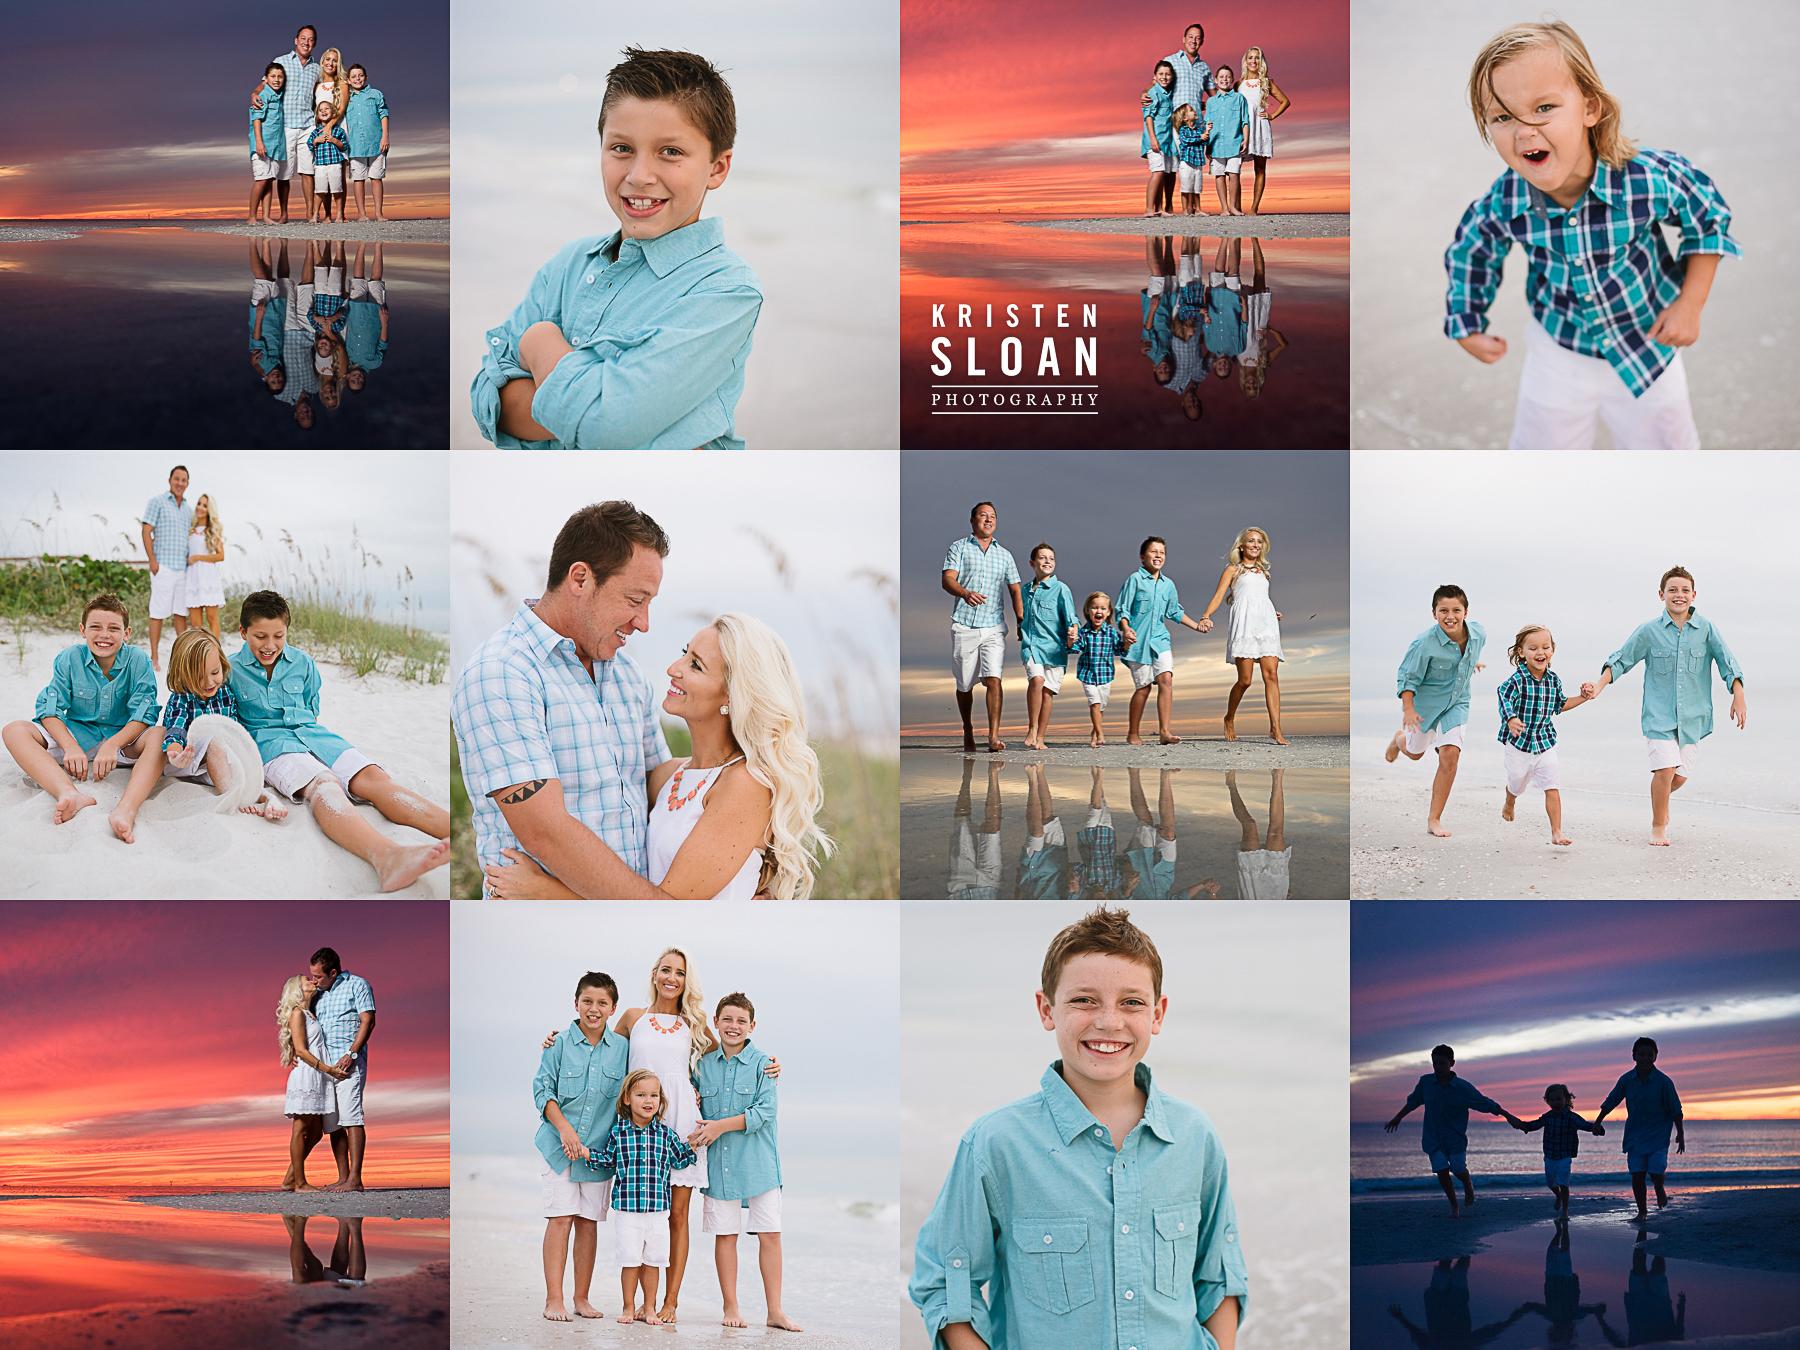 Sand Pebble Resort Condos Treasure Island Beach Family Portrait Photos at Sunset |Treasure Island FL Photographer | Gulf Coast Florida Sunset